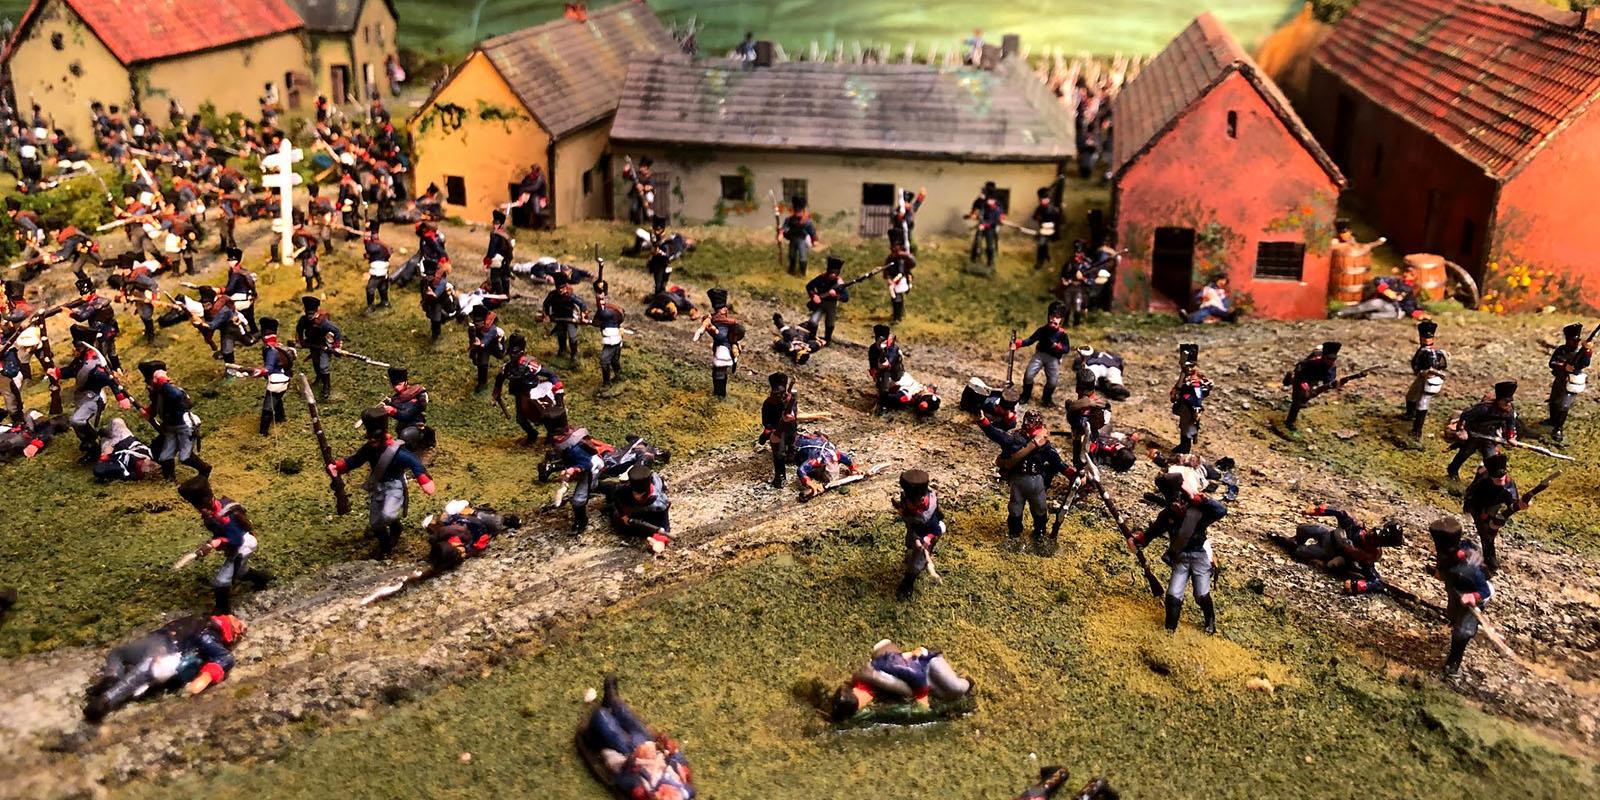 A section of Major General Cowan's Waterloo diorama